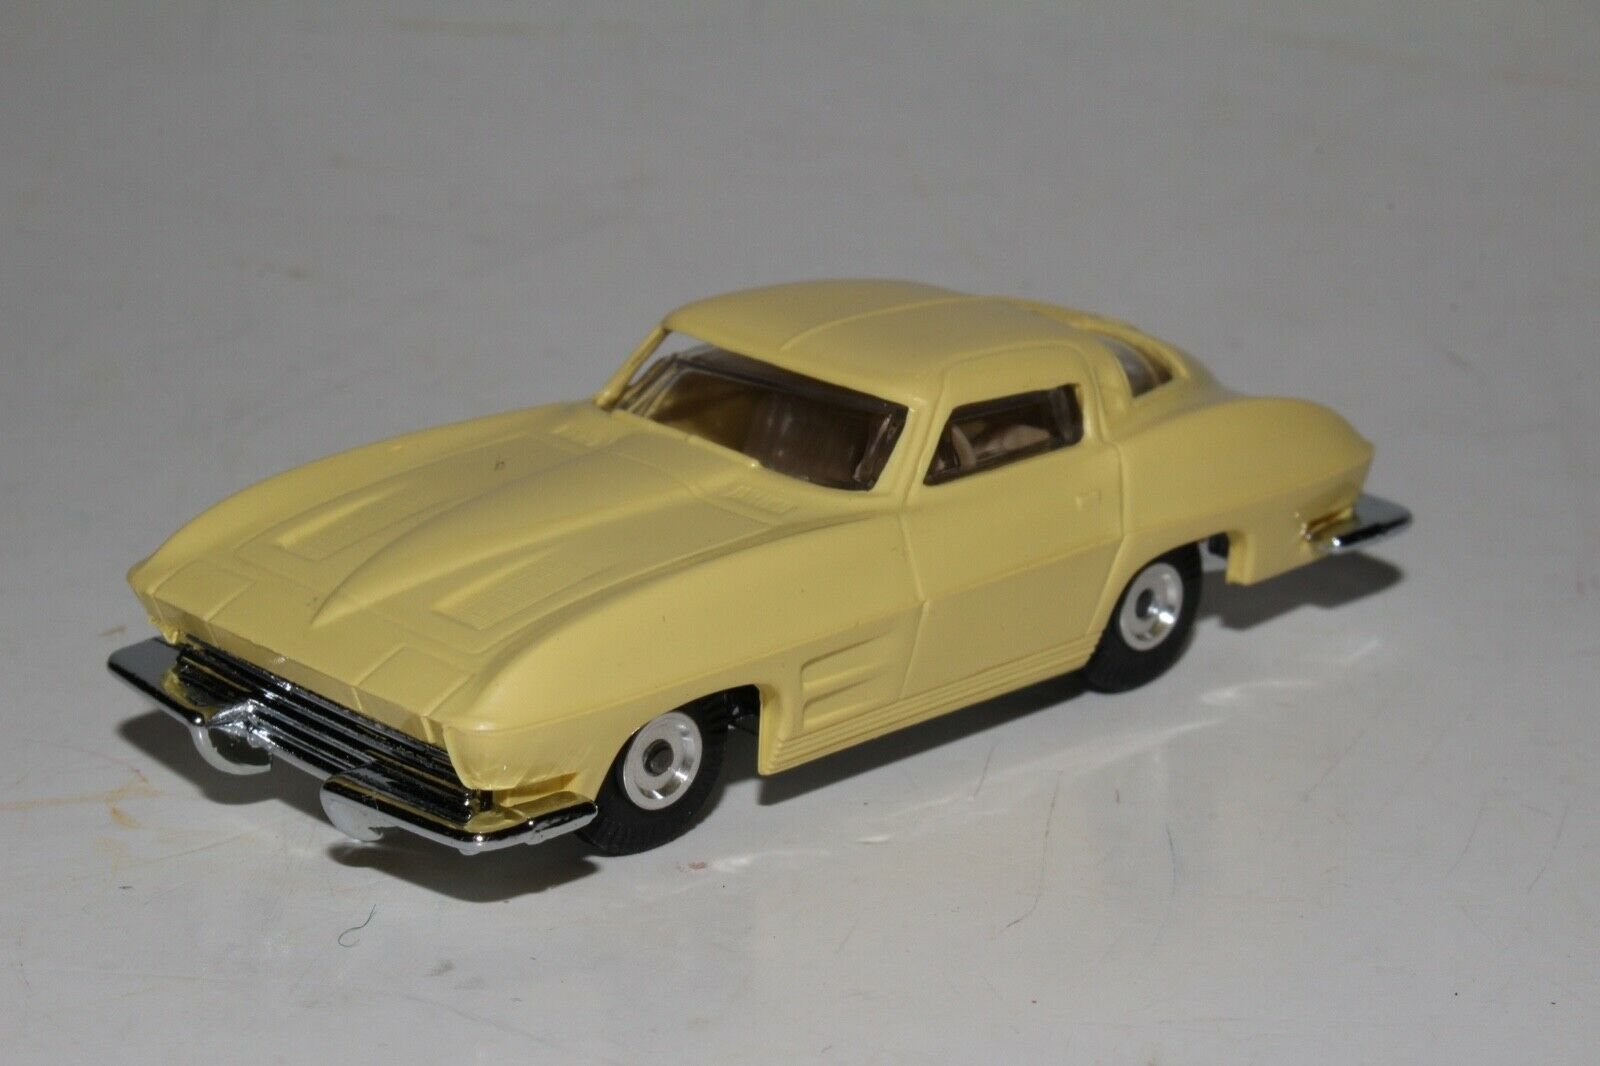 Aurora Cigar Box Coches Chevrolet Corvette Stingris-, Amarillo, Excelente, Original